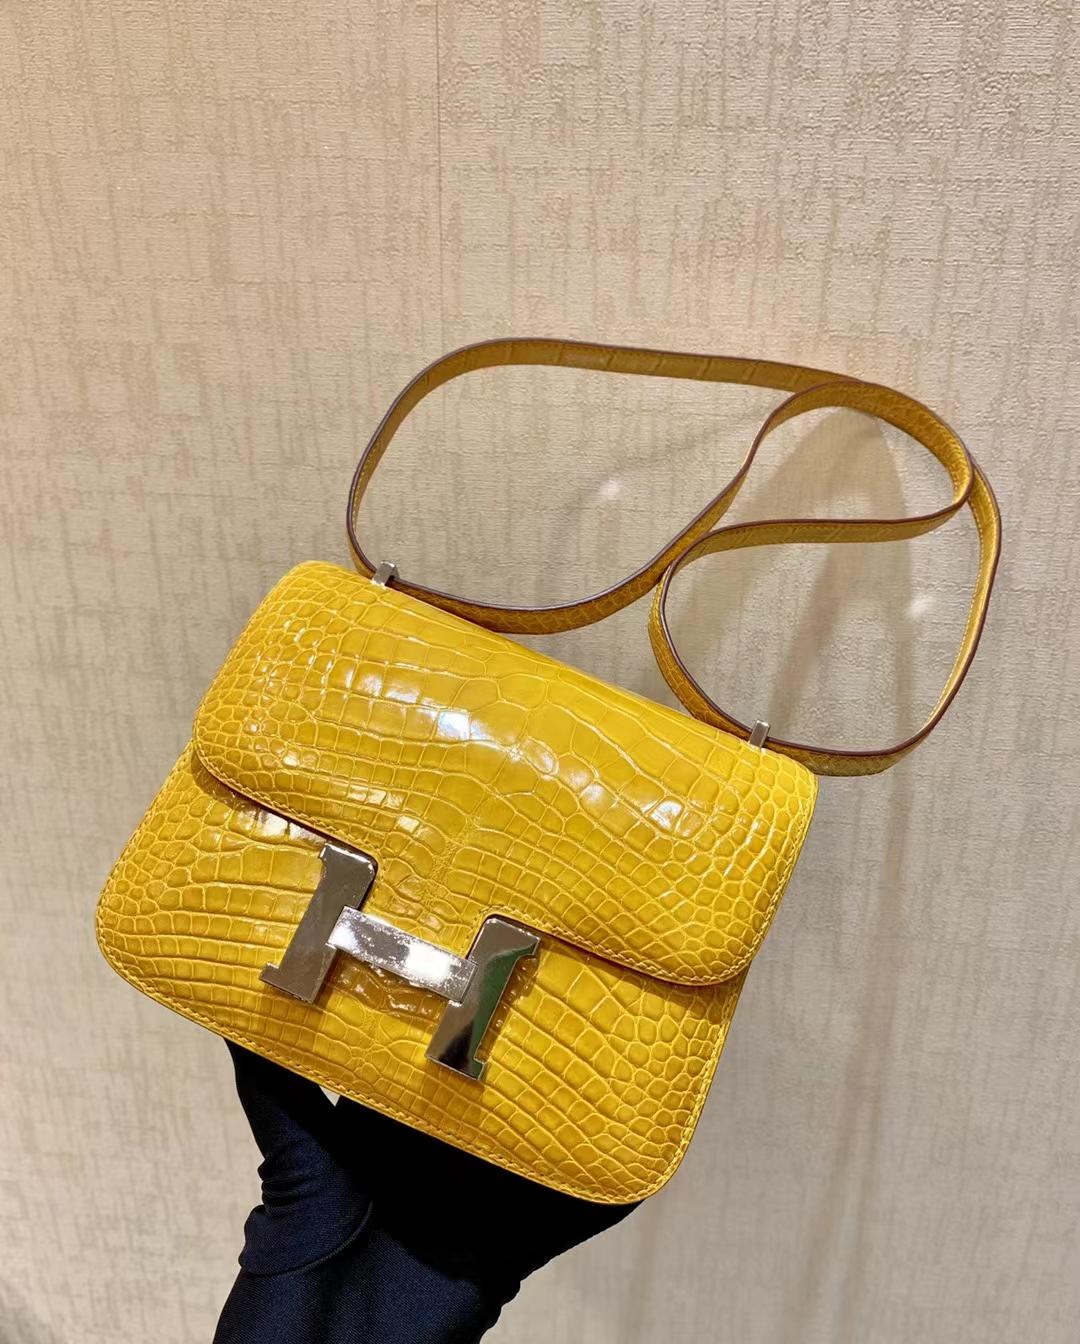 Hermès(爱马仕)Constance 康斯坦斯 鳄鱼皮 9D 琥珀黄 金扣 18cm 顶级纯手工 现货